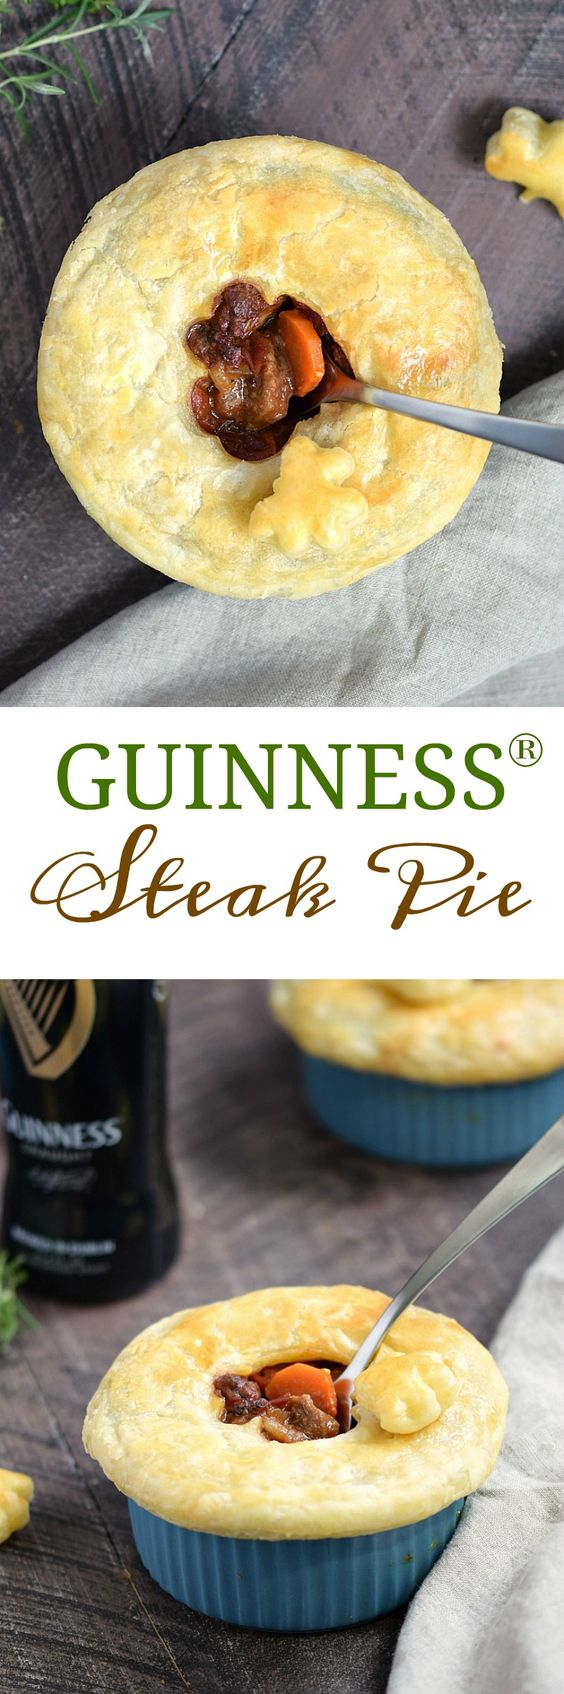 Guinness Steak Pie - Cooking With Curls | Recipe | Steak ...